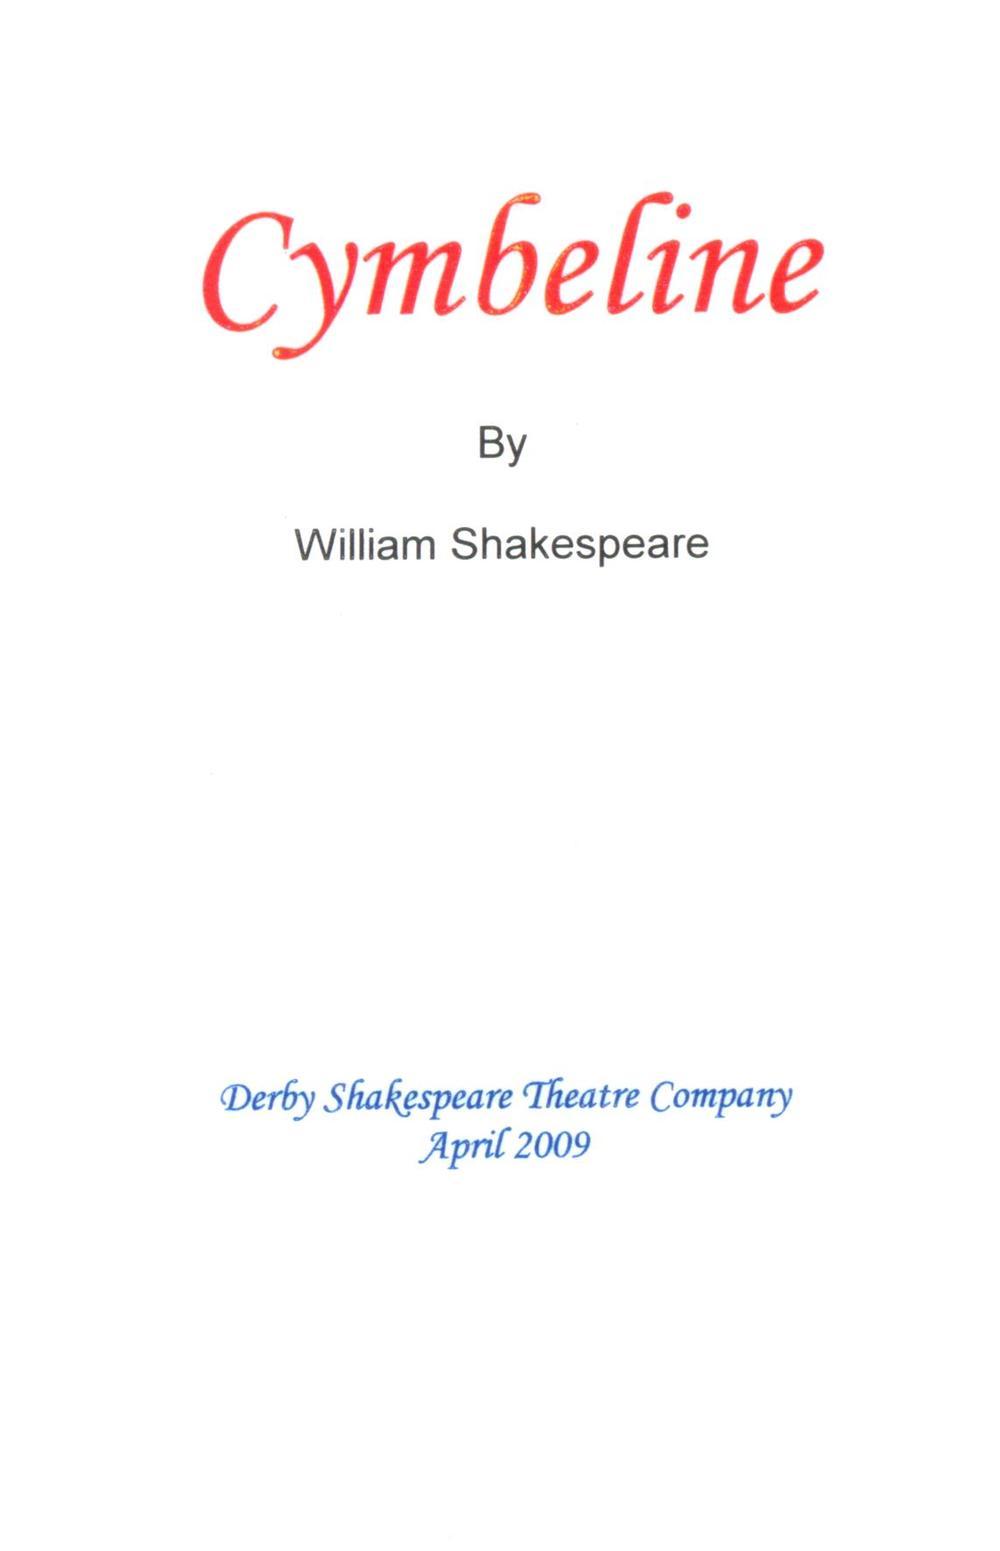 'Cymbeline' 2009